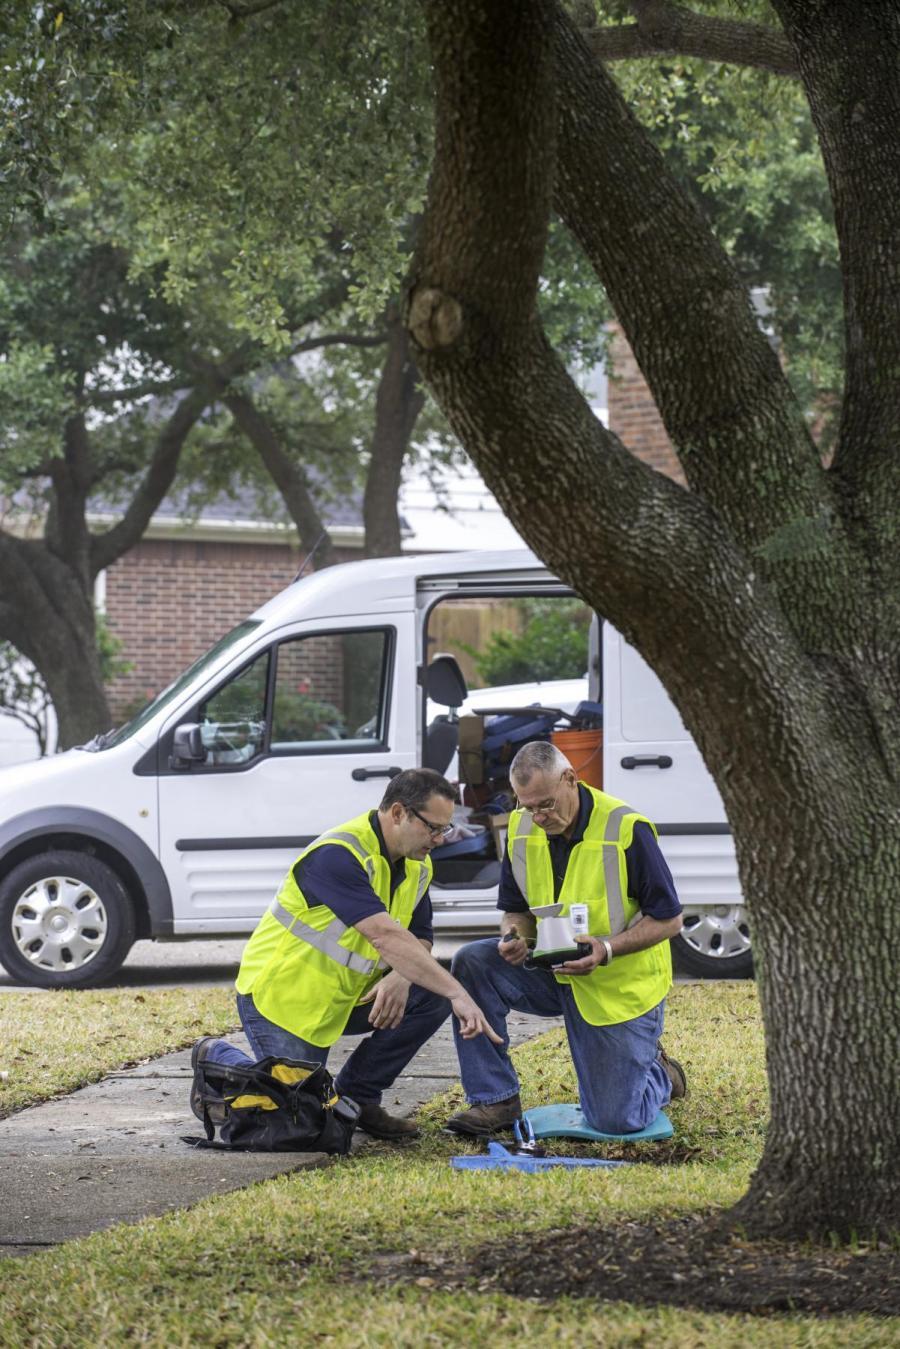 2 men installing a water meter